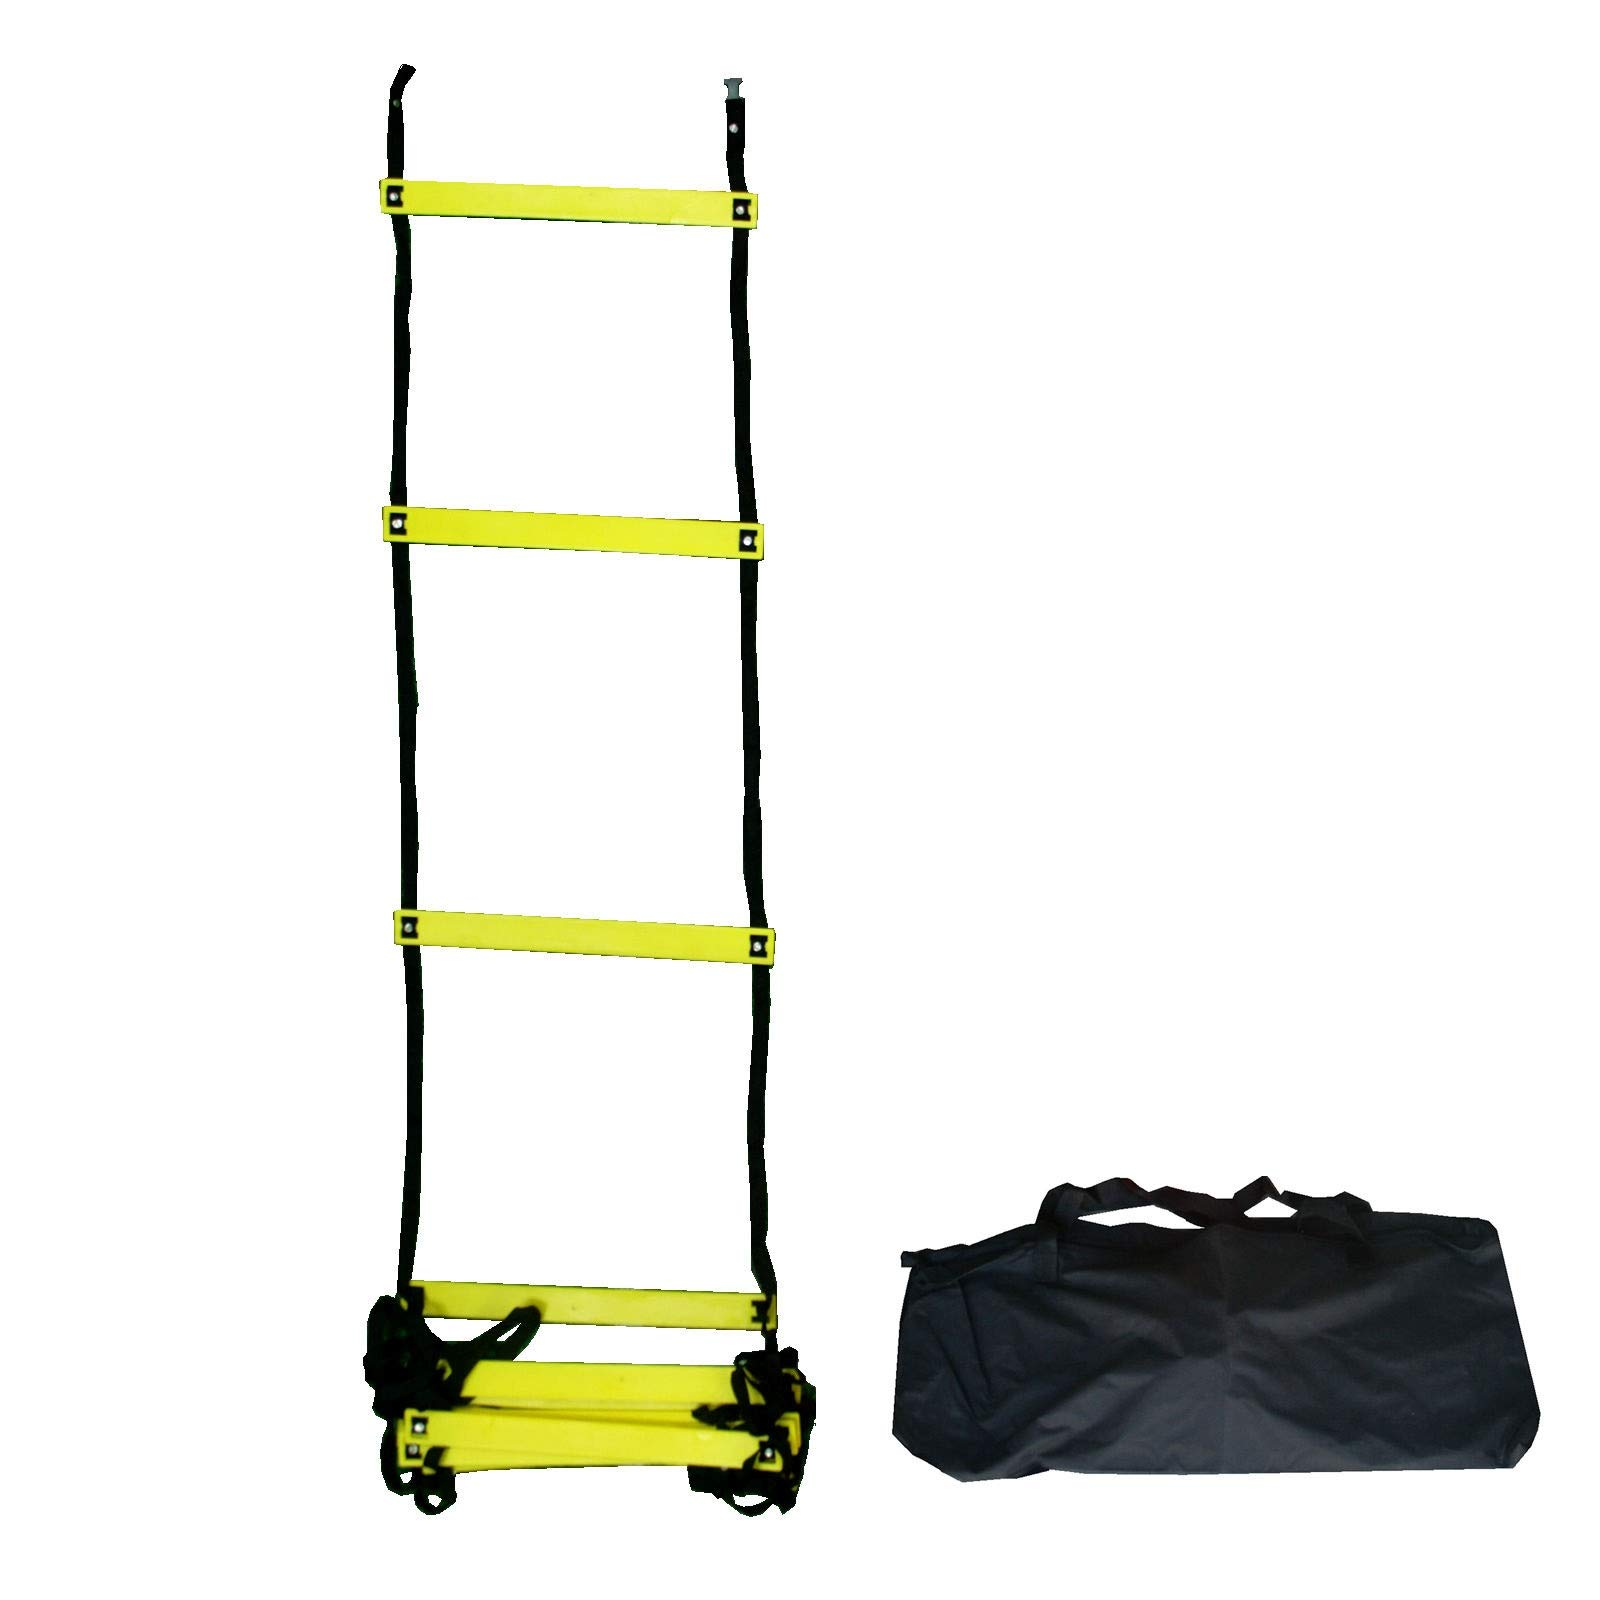 Bright Sun 1 Set Speed Agility Training Sports Equipment Ladder 15 ft #BDMN by Bright Sun